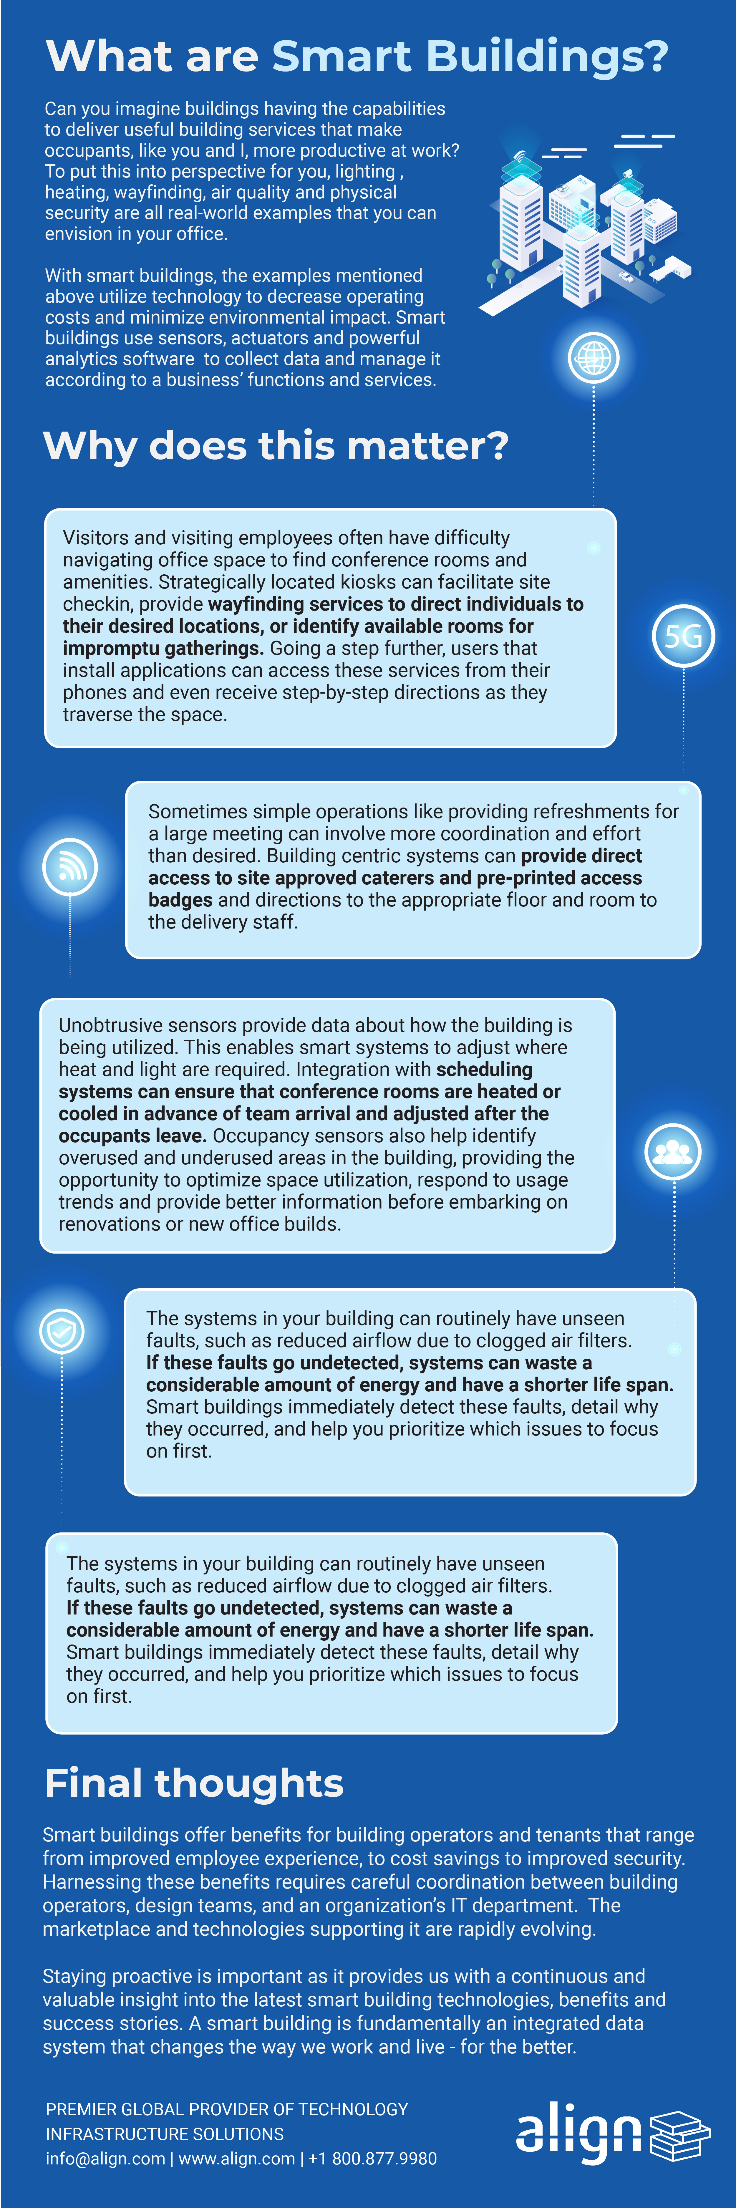 smartbuildlings_webinfographic-01